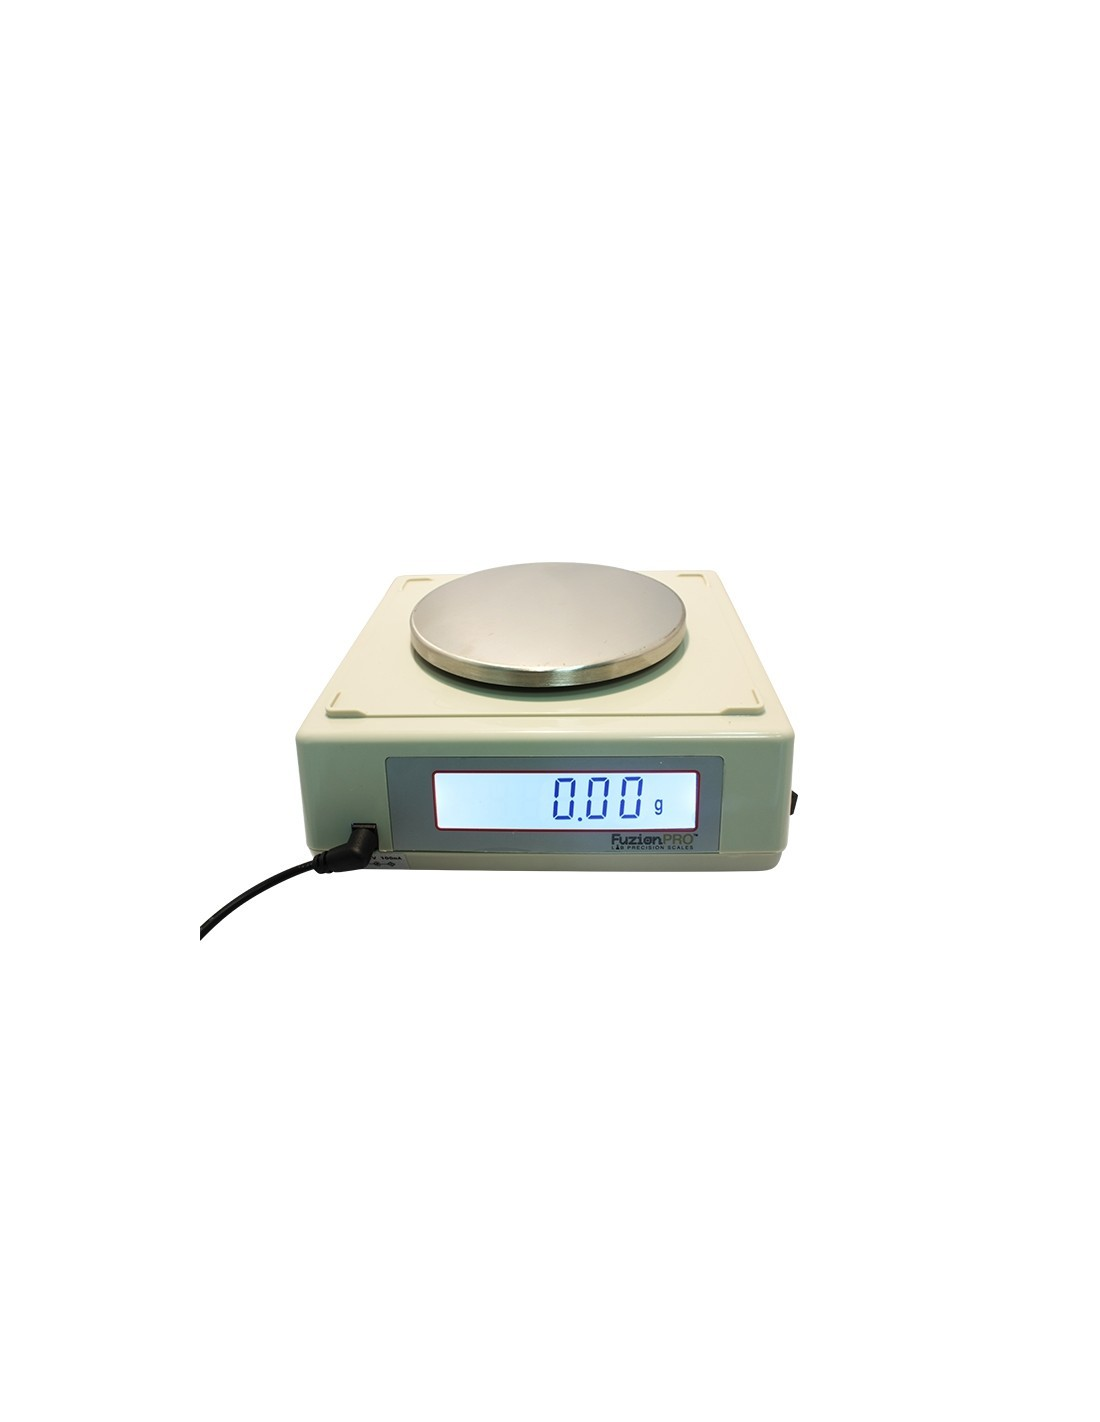 bascula-digital-precision-go-pro-300-0-01gr 0